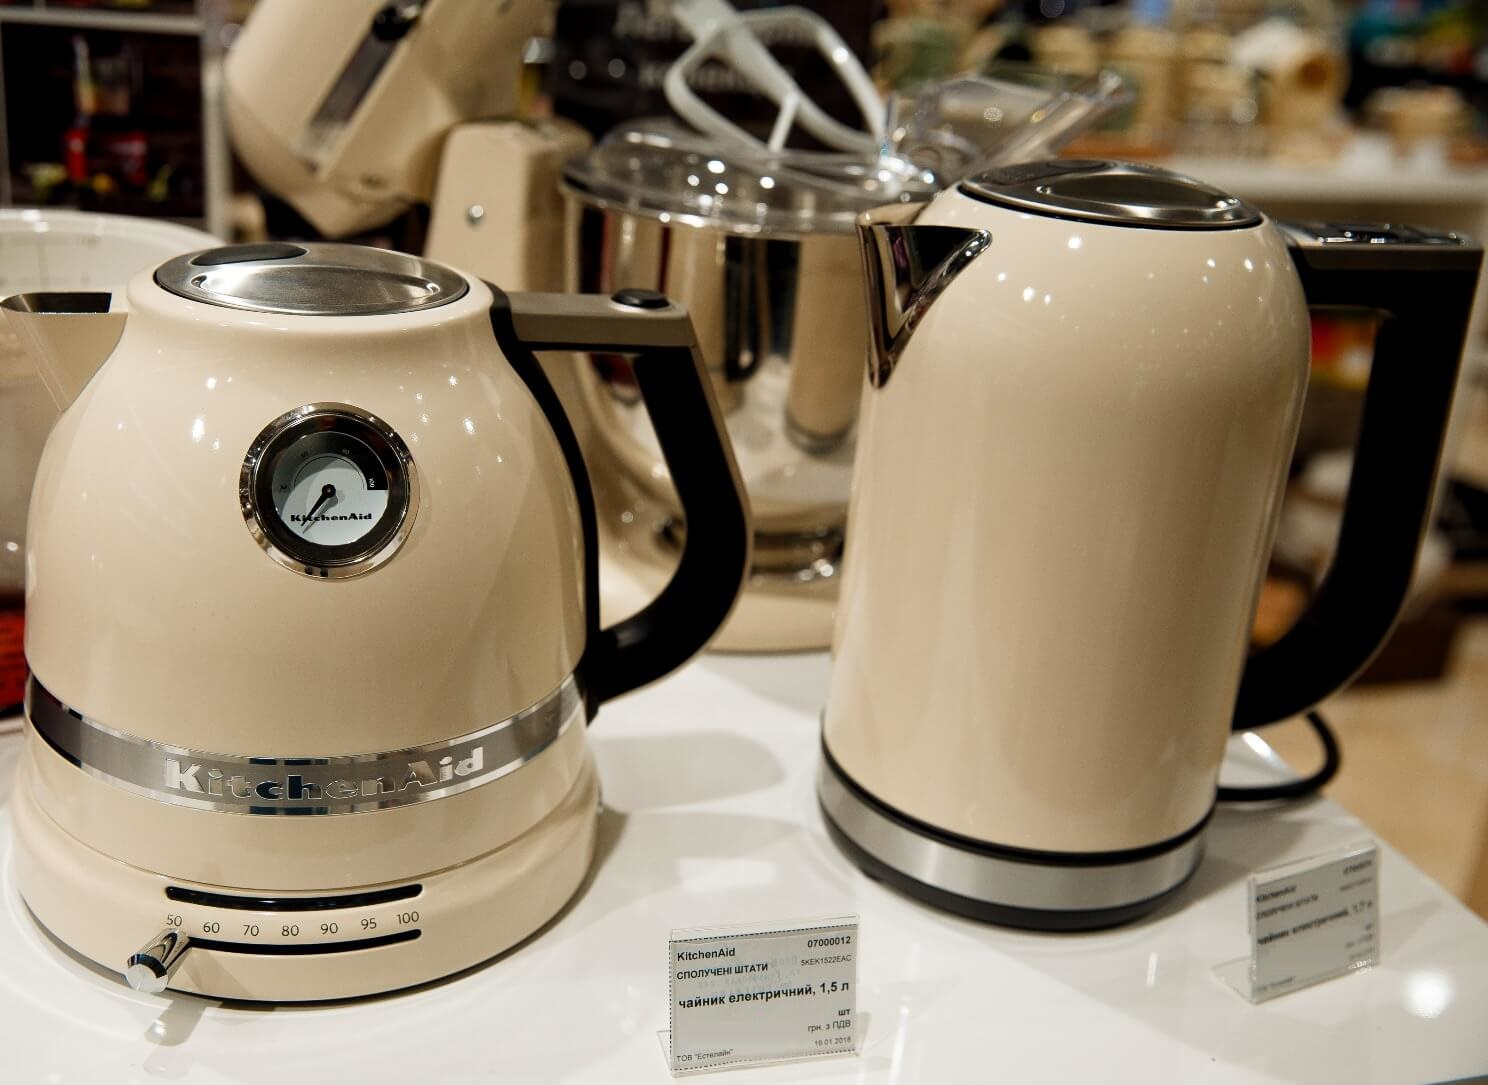 Чайник электрический KitchenAid, объем 1,5 л, кремовый KitchenAid 5KEK1522EAC фото 3